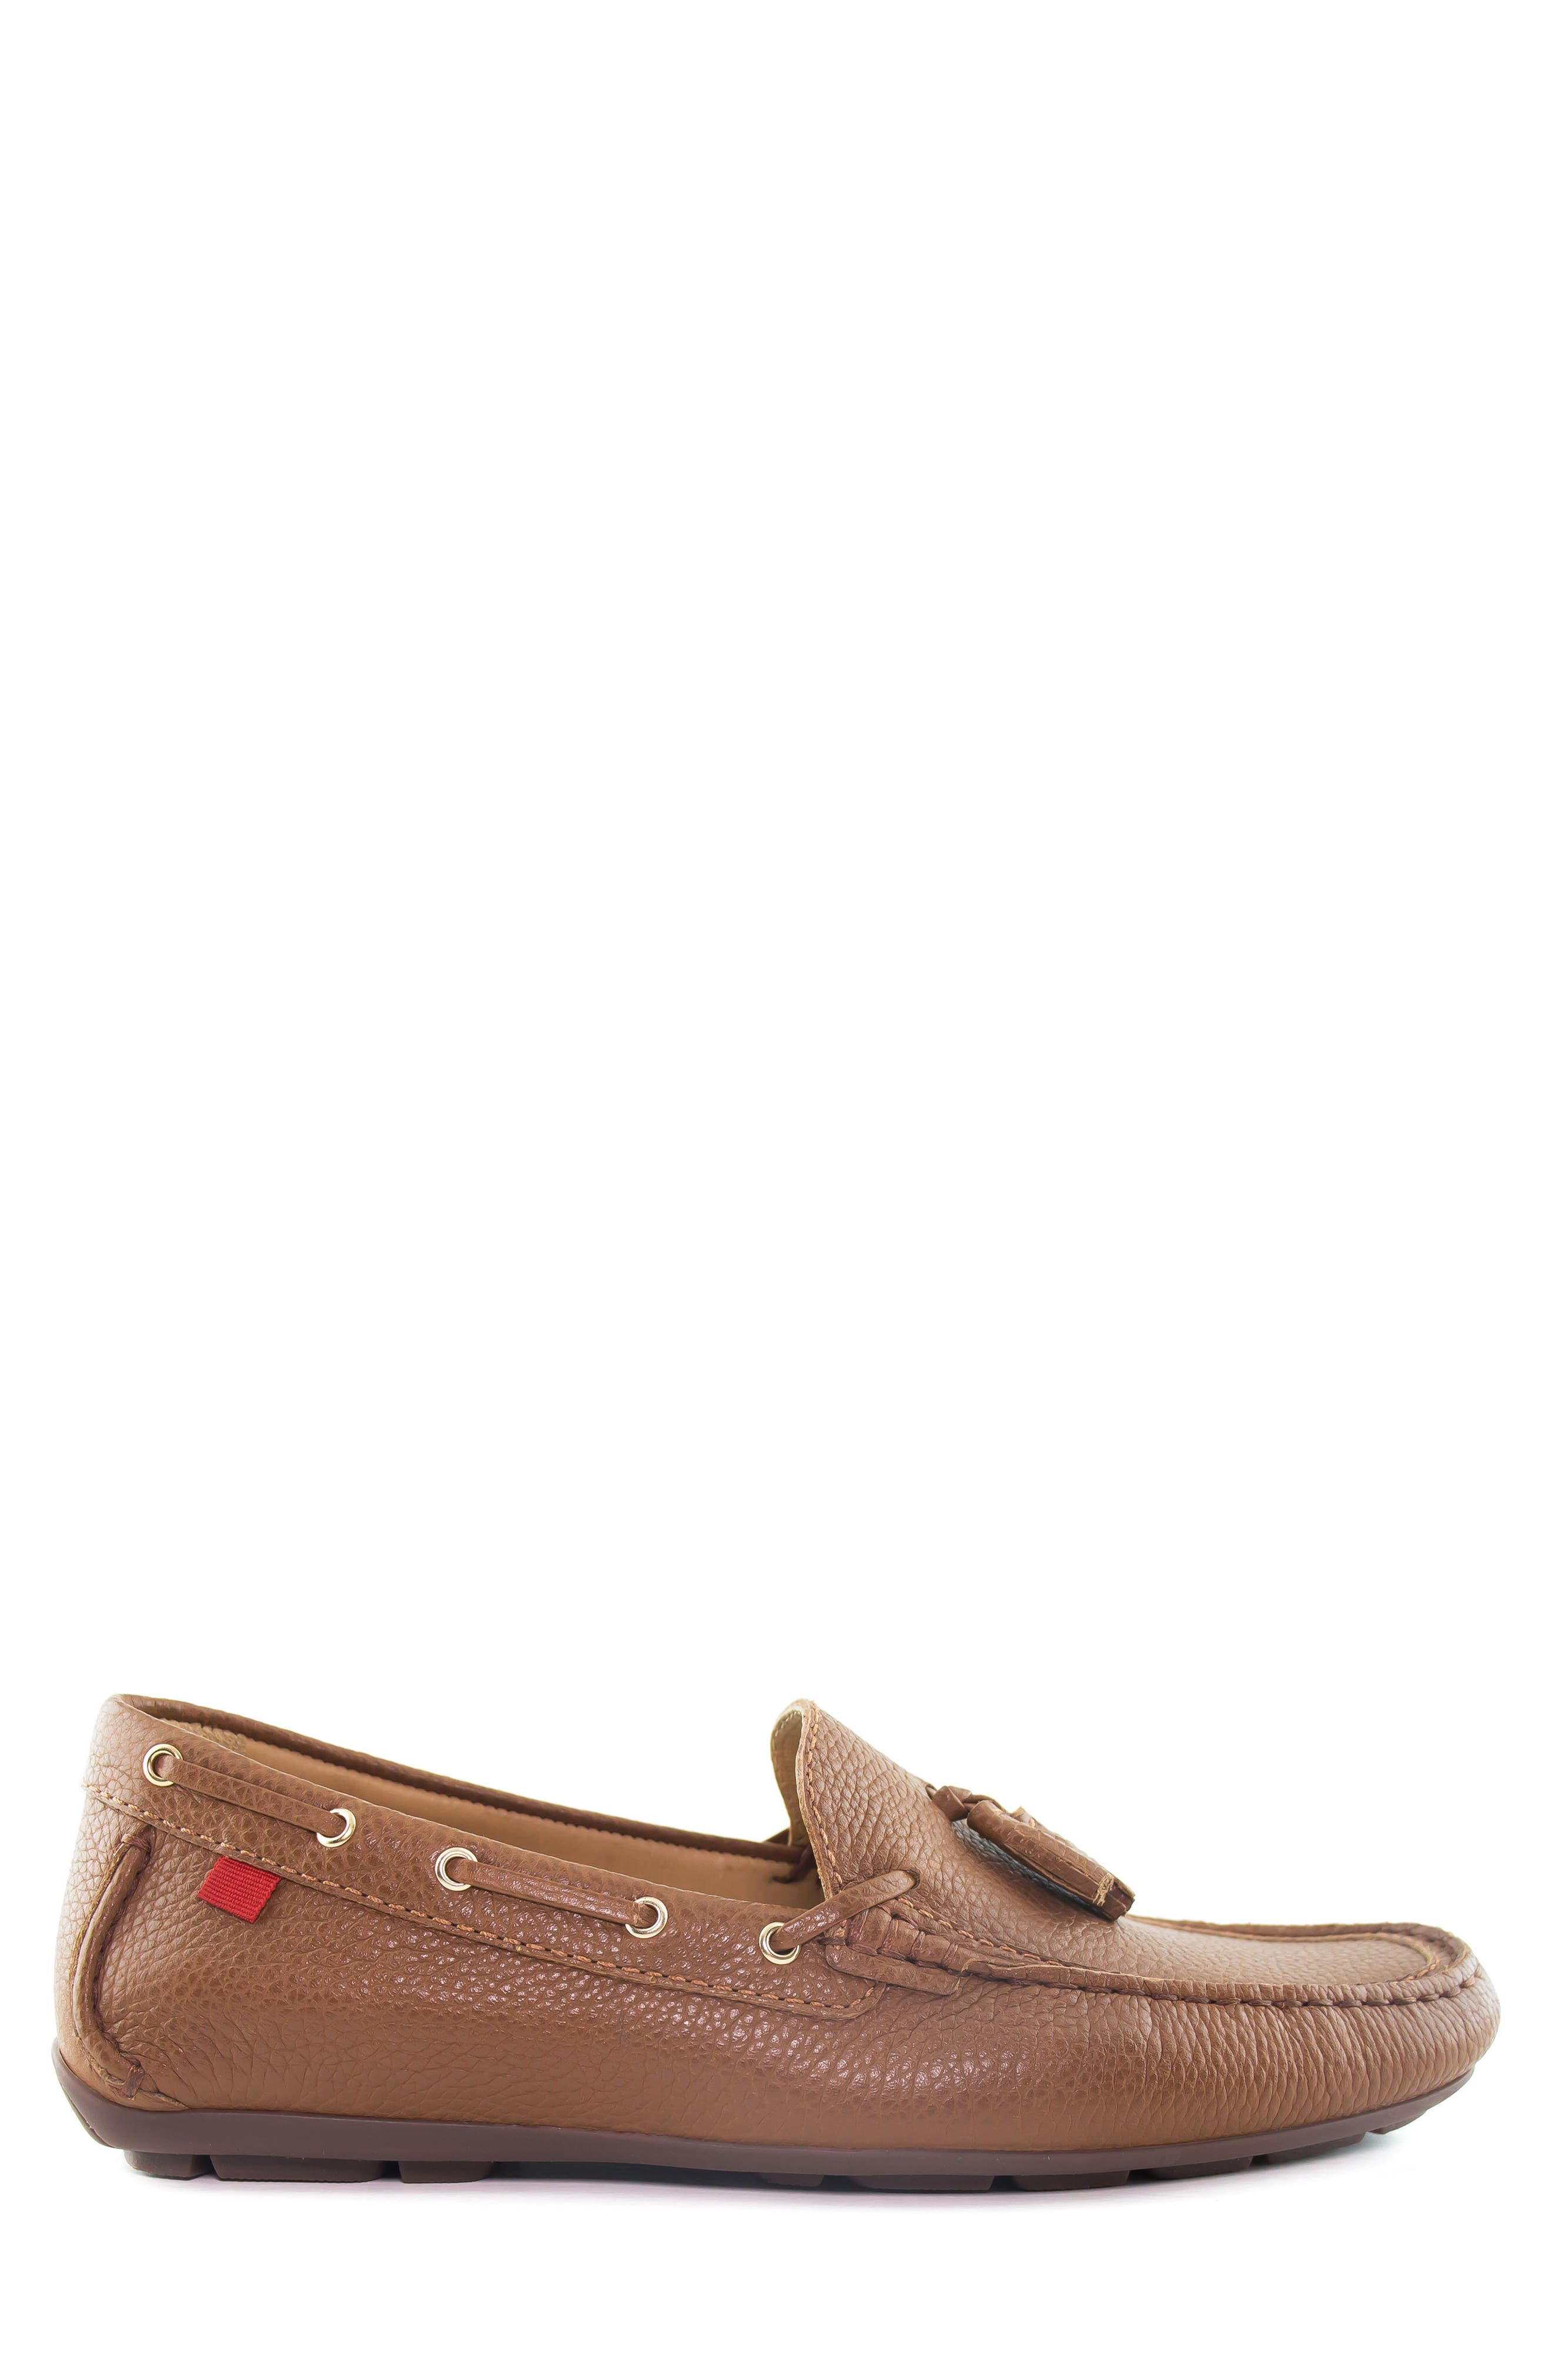 Bushwick Tasseled Driving Loafer,                             Alternate thumbnail 3, color,                             Cognac